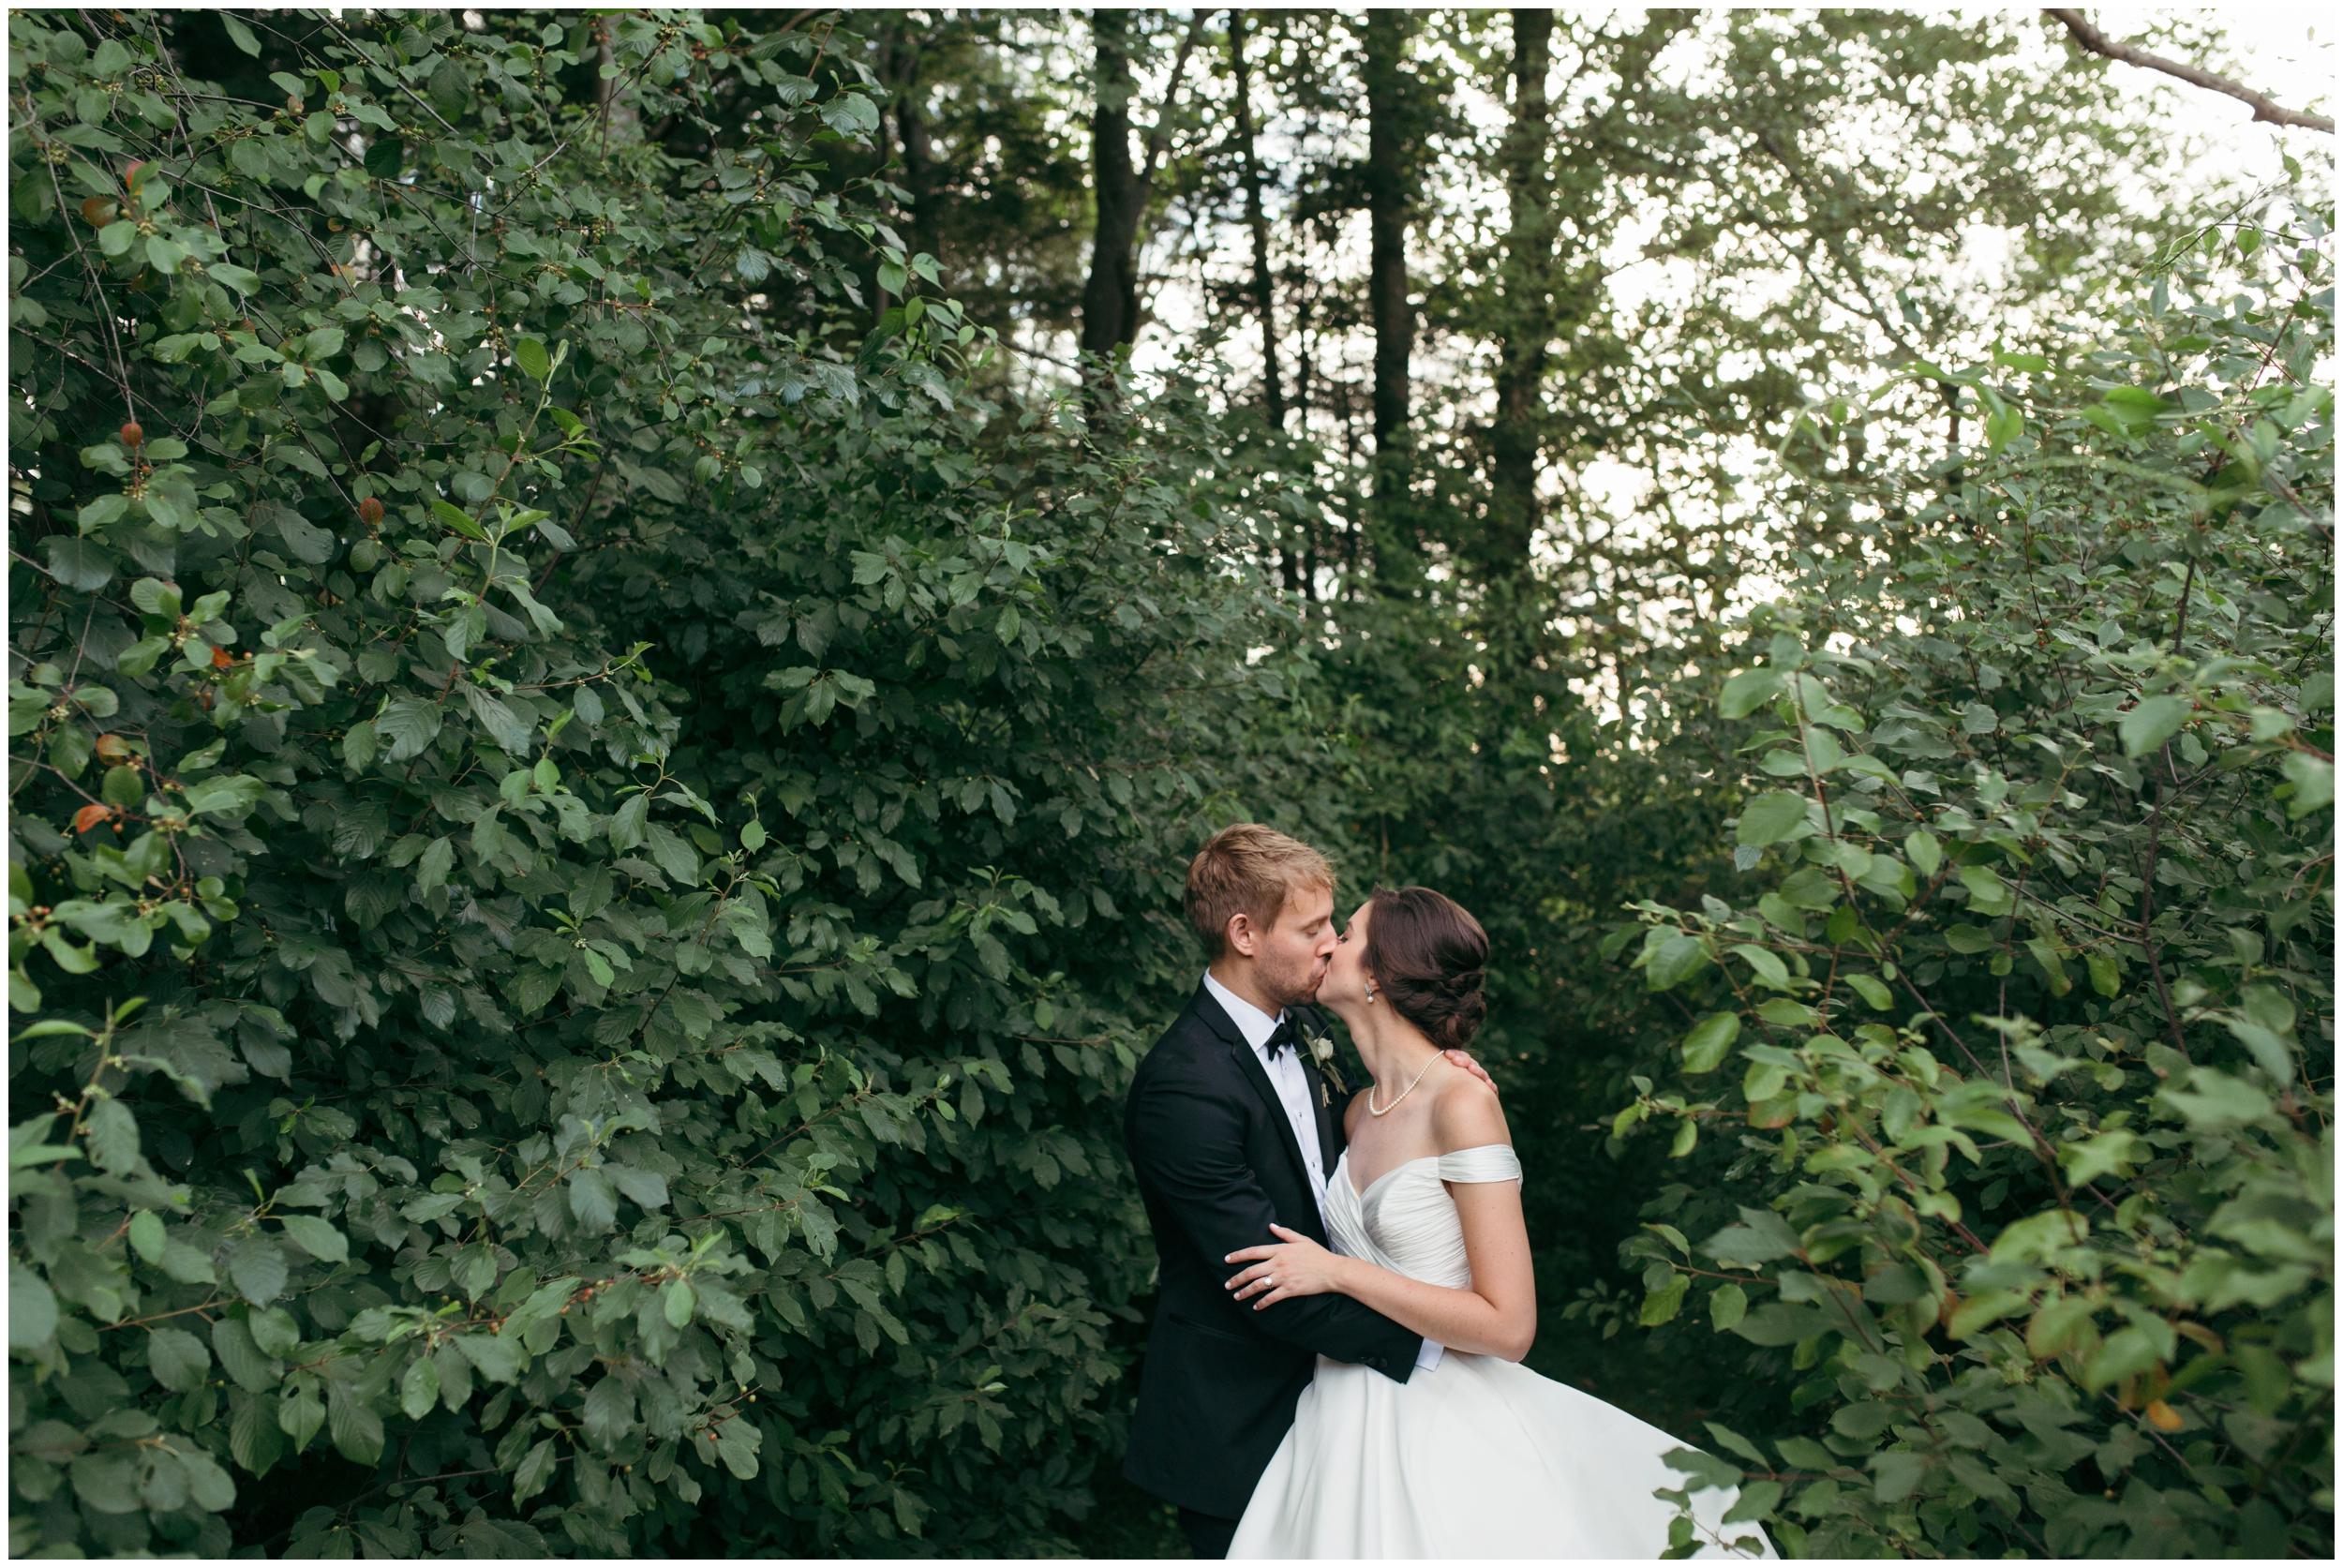 Willowdale-Estate-Wedding-Bailey-Q-Photo-Boston-Wedding-Photographer-069.JPG